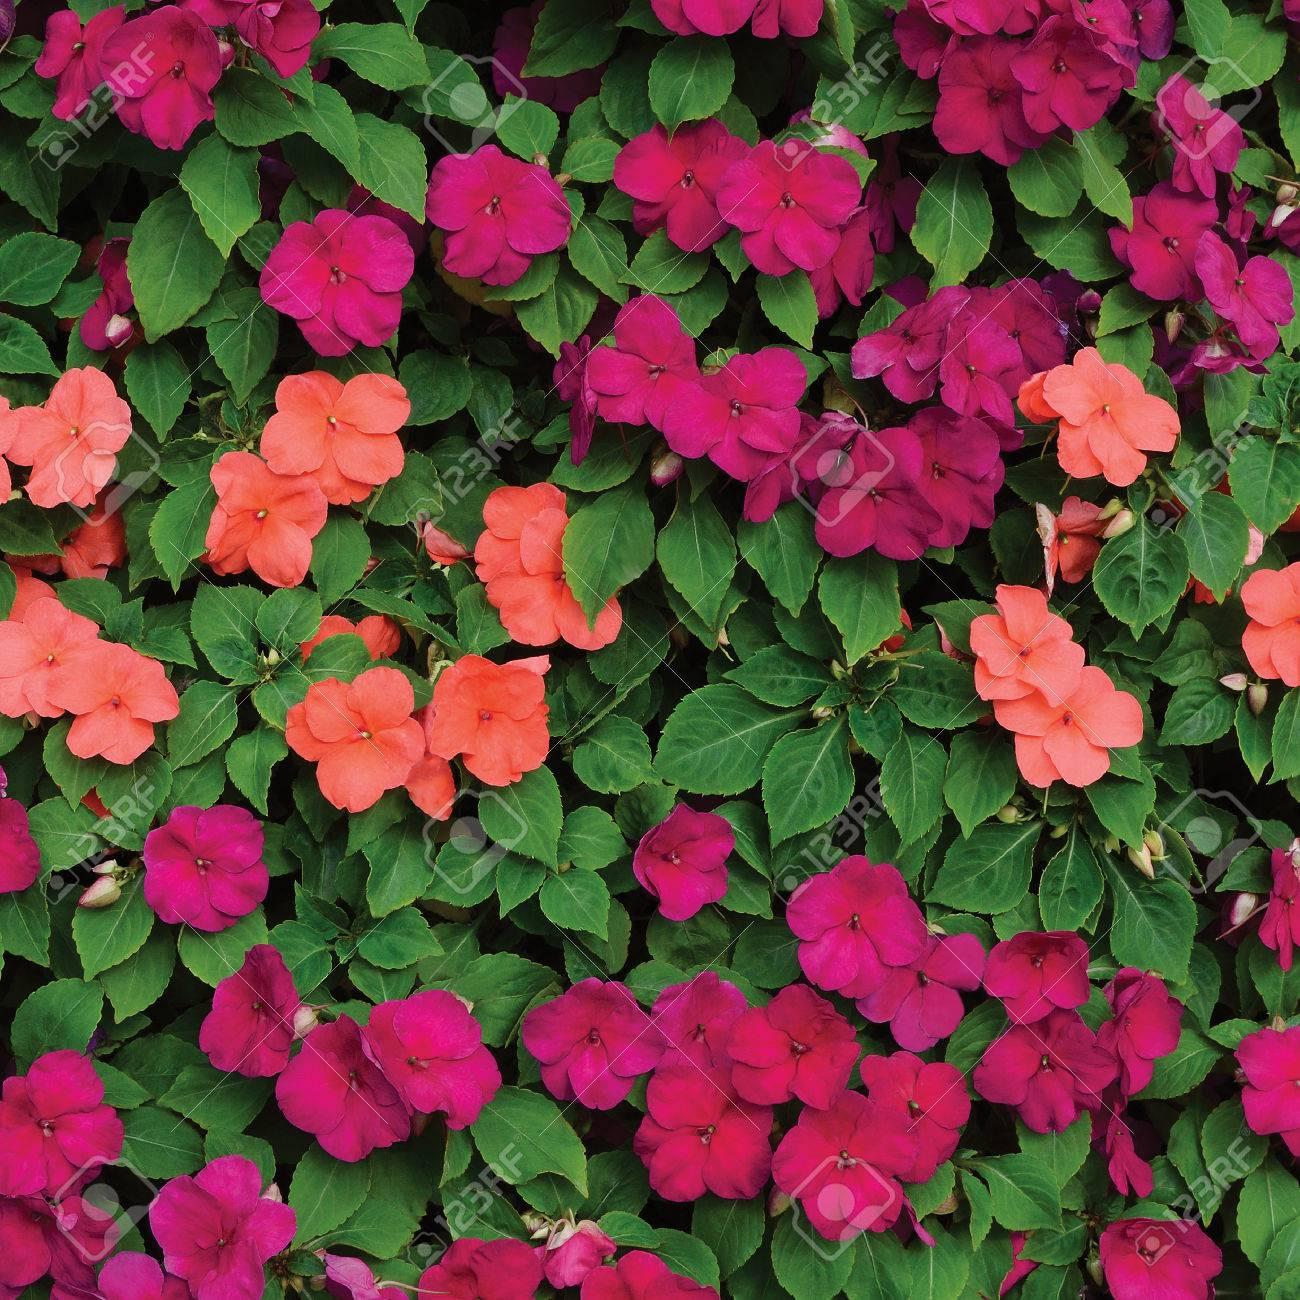 Impatiens Sultanii Busy Lizzie Fleurs Grand Detaillee Colorful Fond Vertical Motif Gros Plan Magenta Violet Rouge Rose Aka